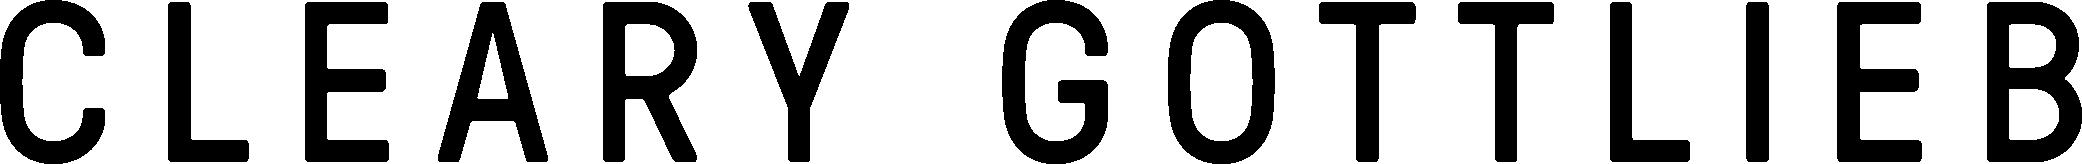 CG_logo_master_BLK